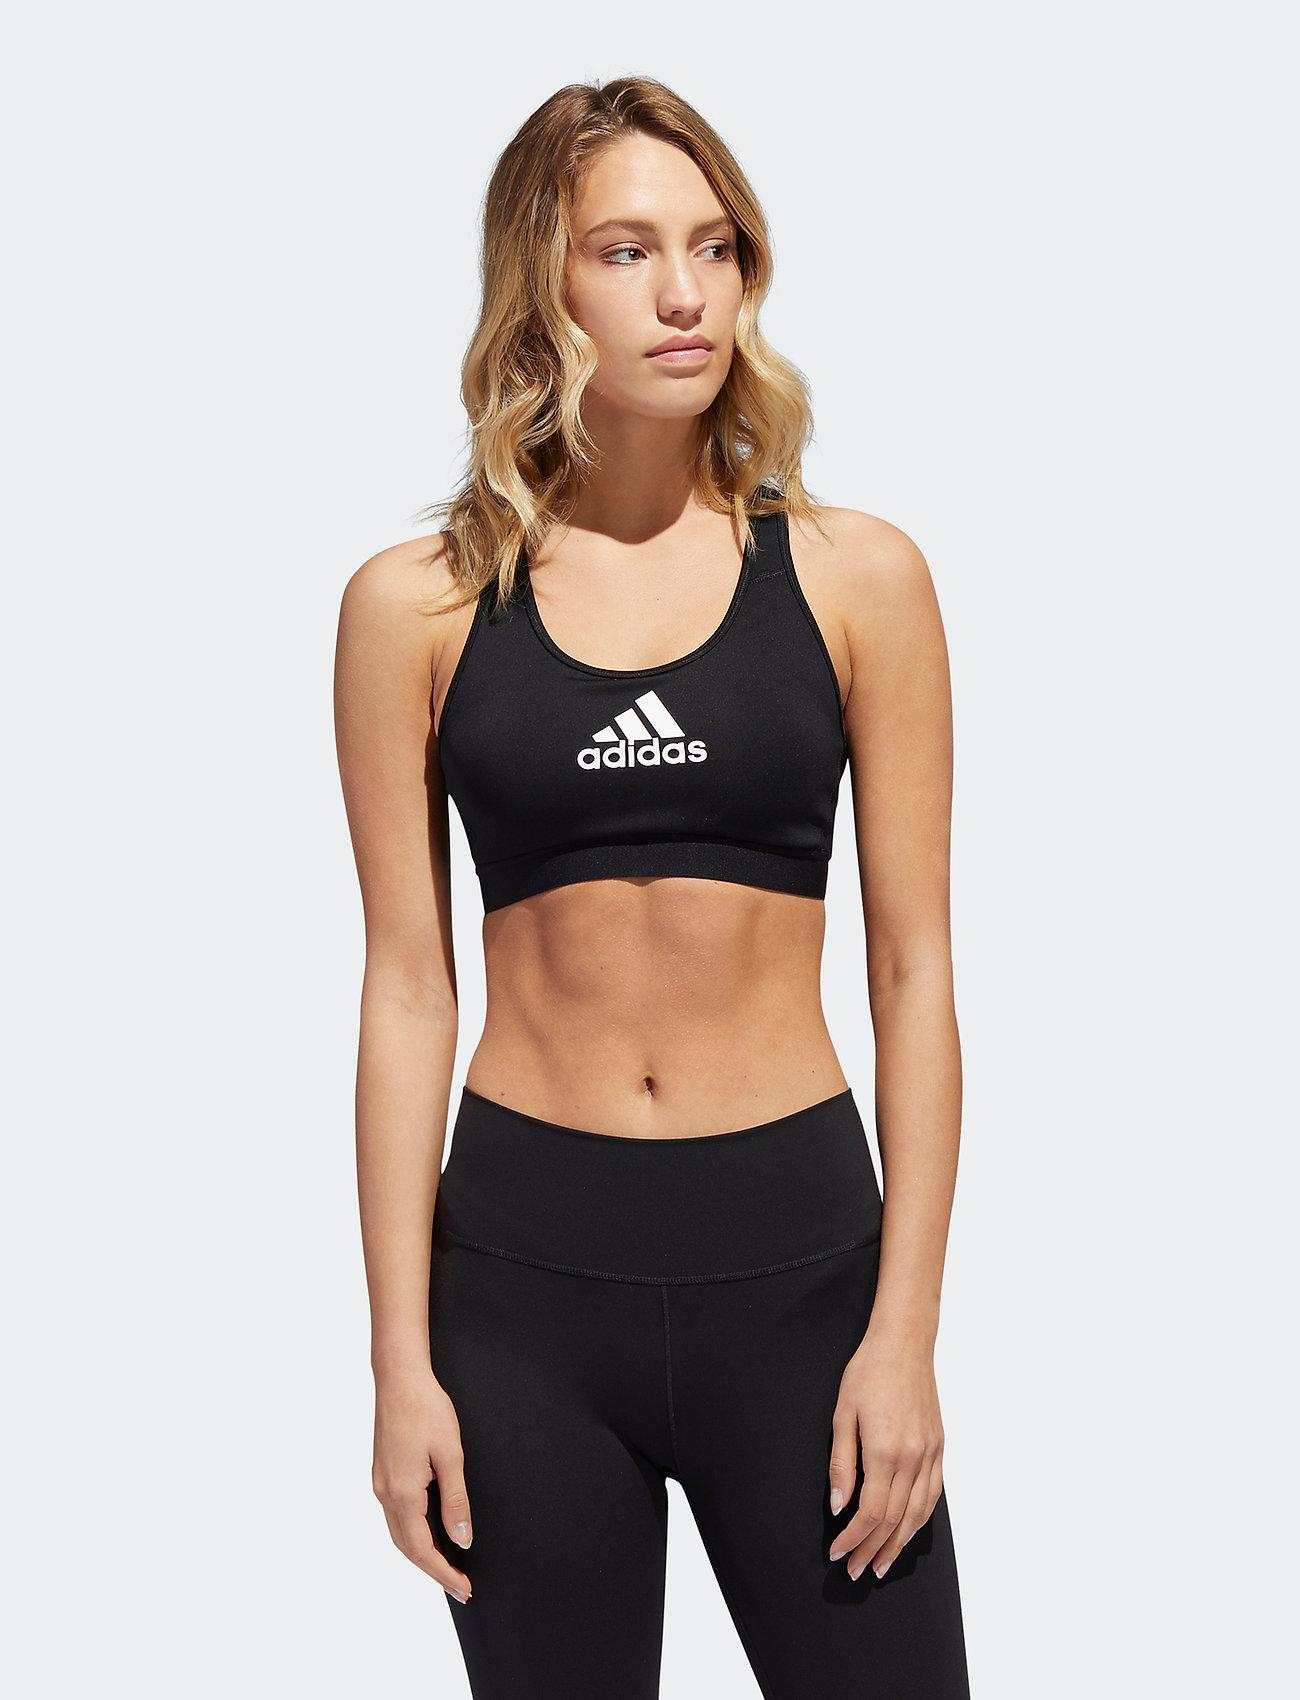 adidas Performance - DRST ASK BRA - sport bras: medium - black - 0